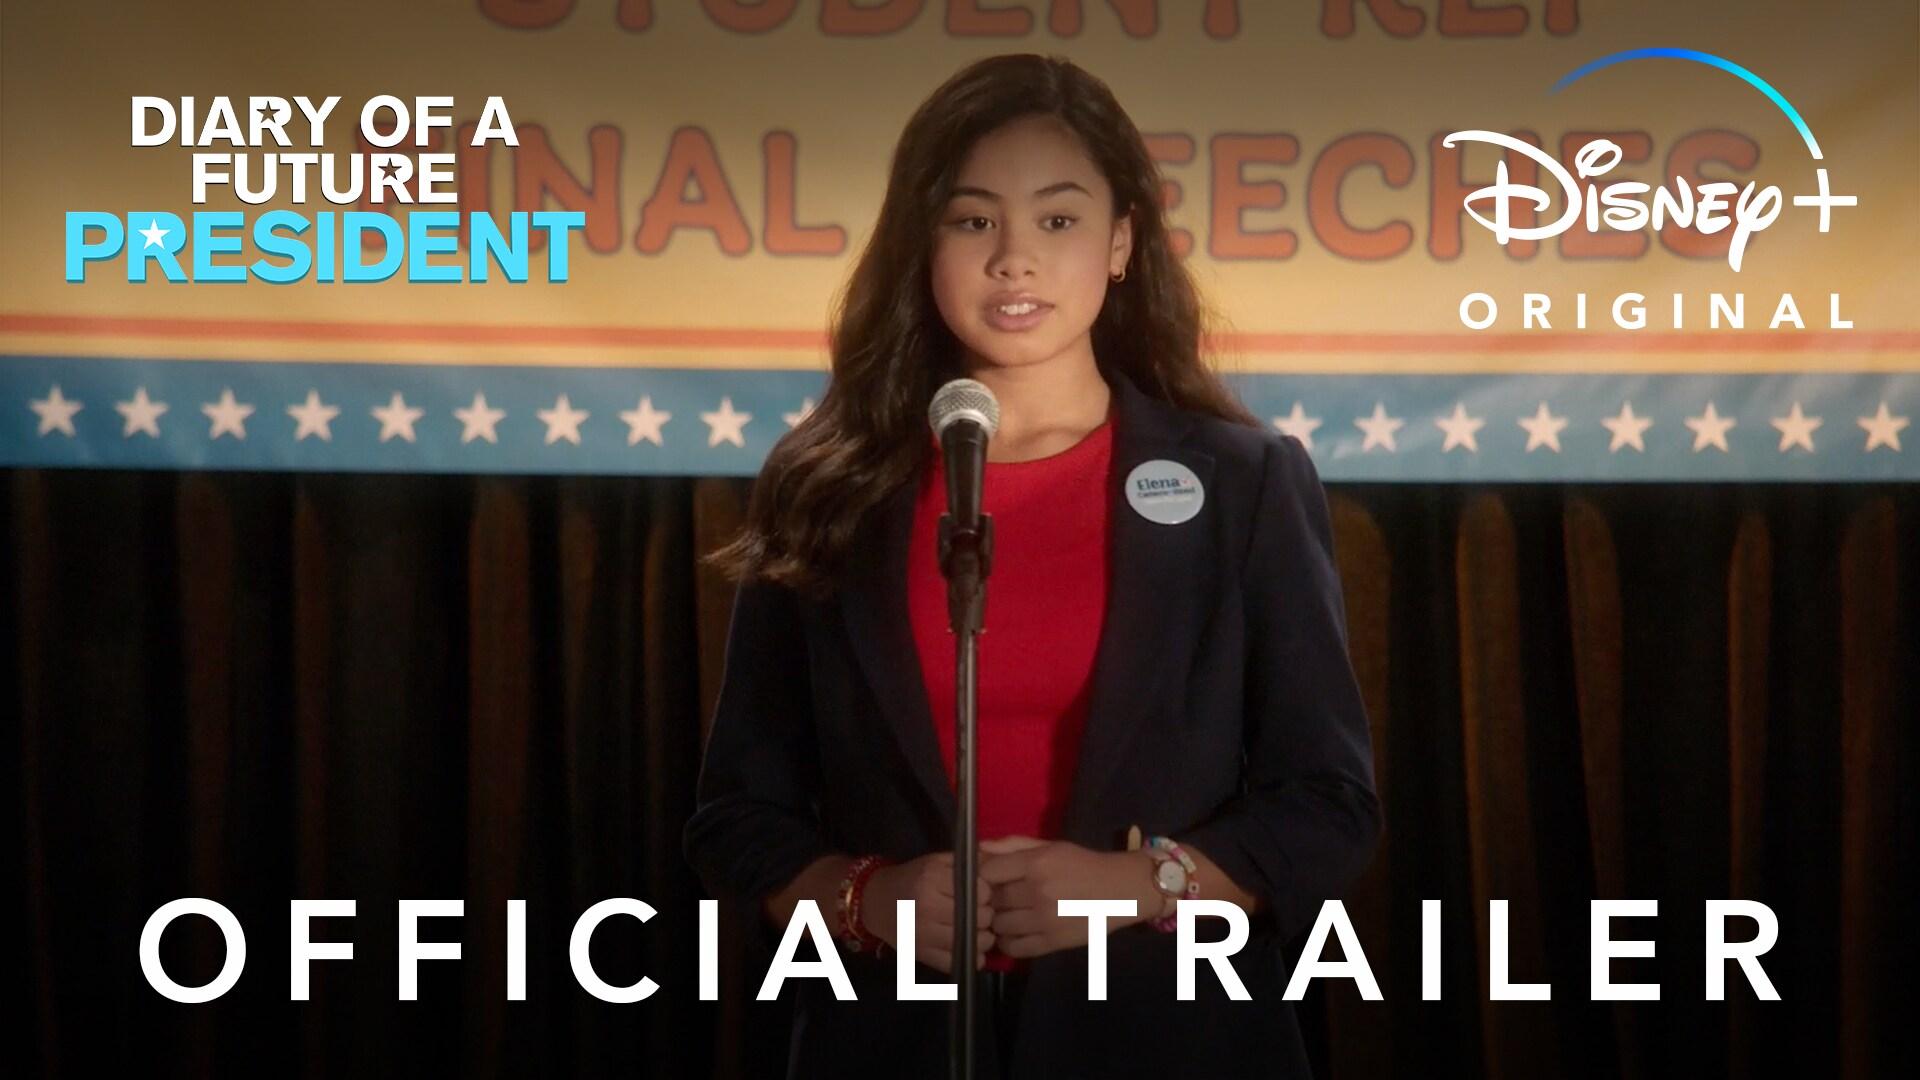 Diary of a Future President Season 2 | Official Trailer | Disney+